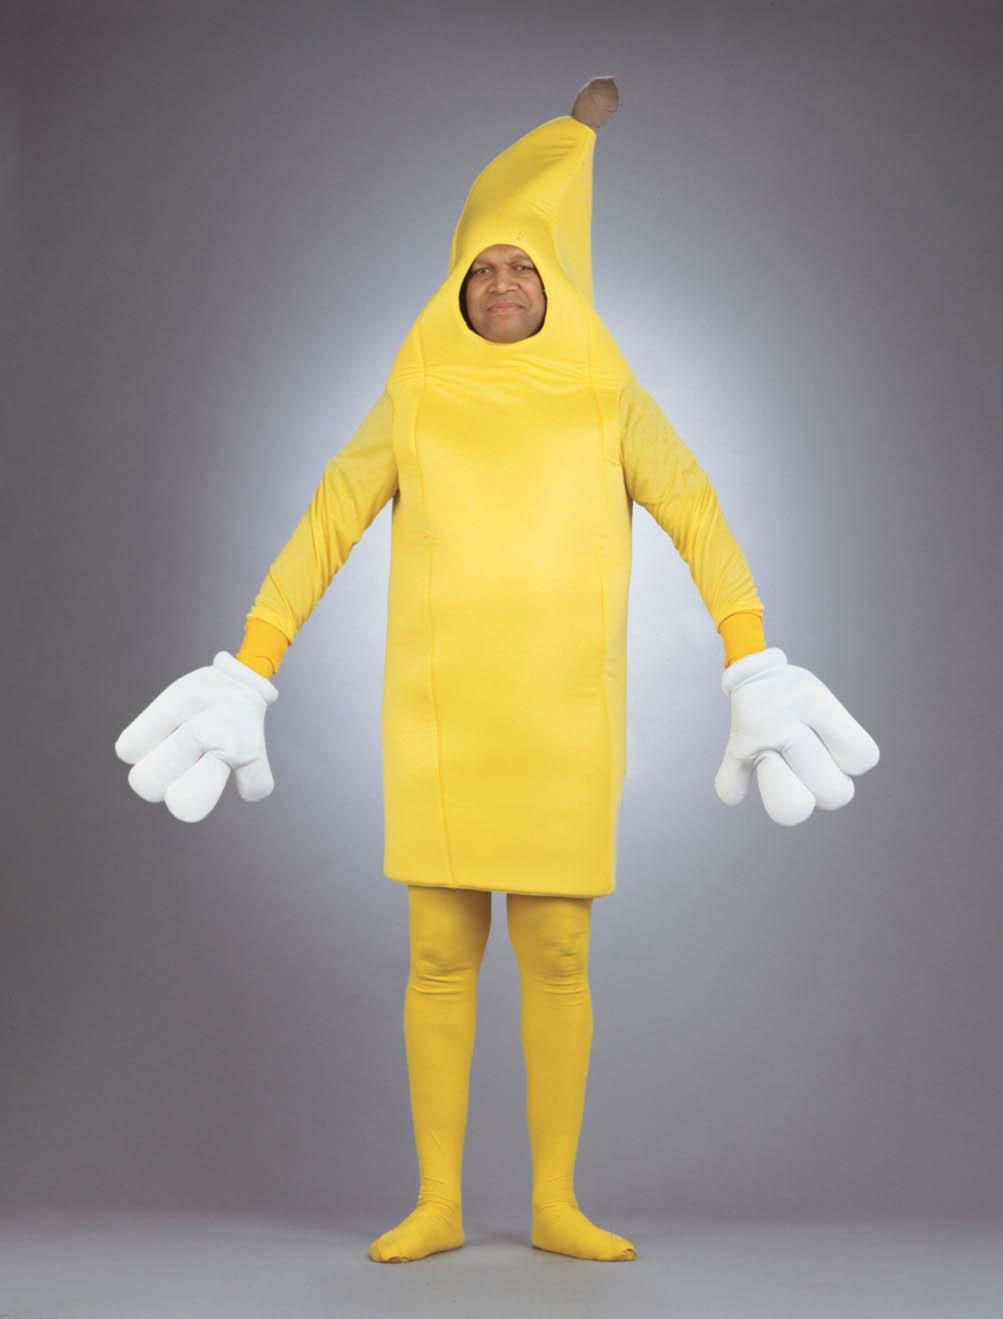 Костюм банана для мальчика своими руками 17